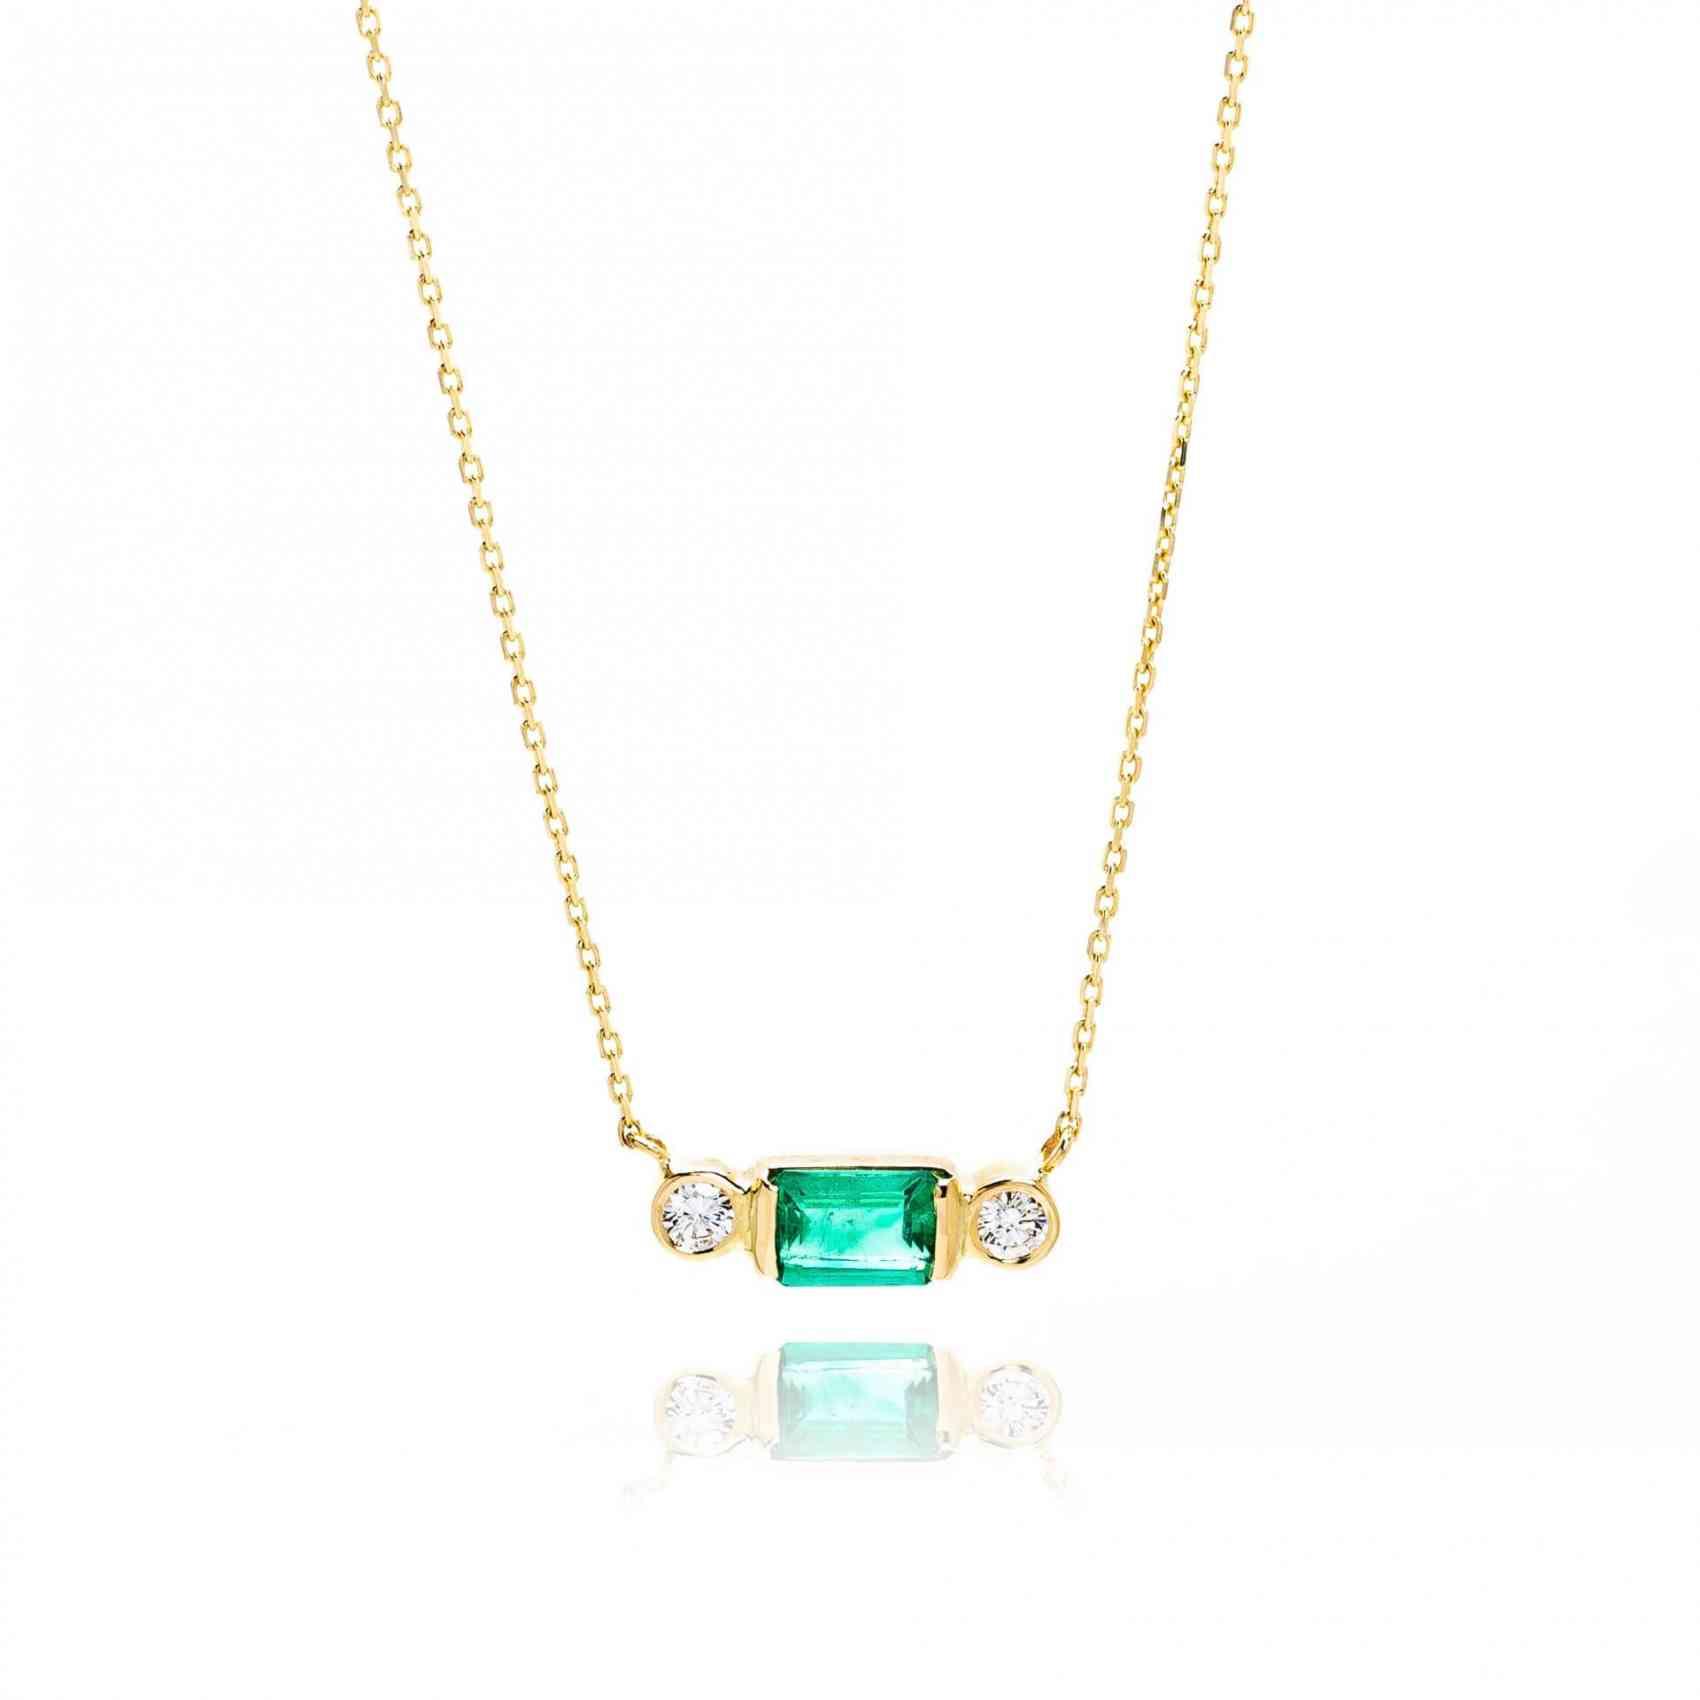 Colier din Aur Galben 18K cu Smarald si Diamante